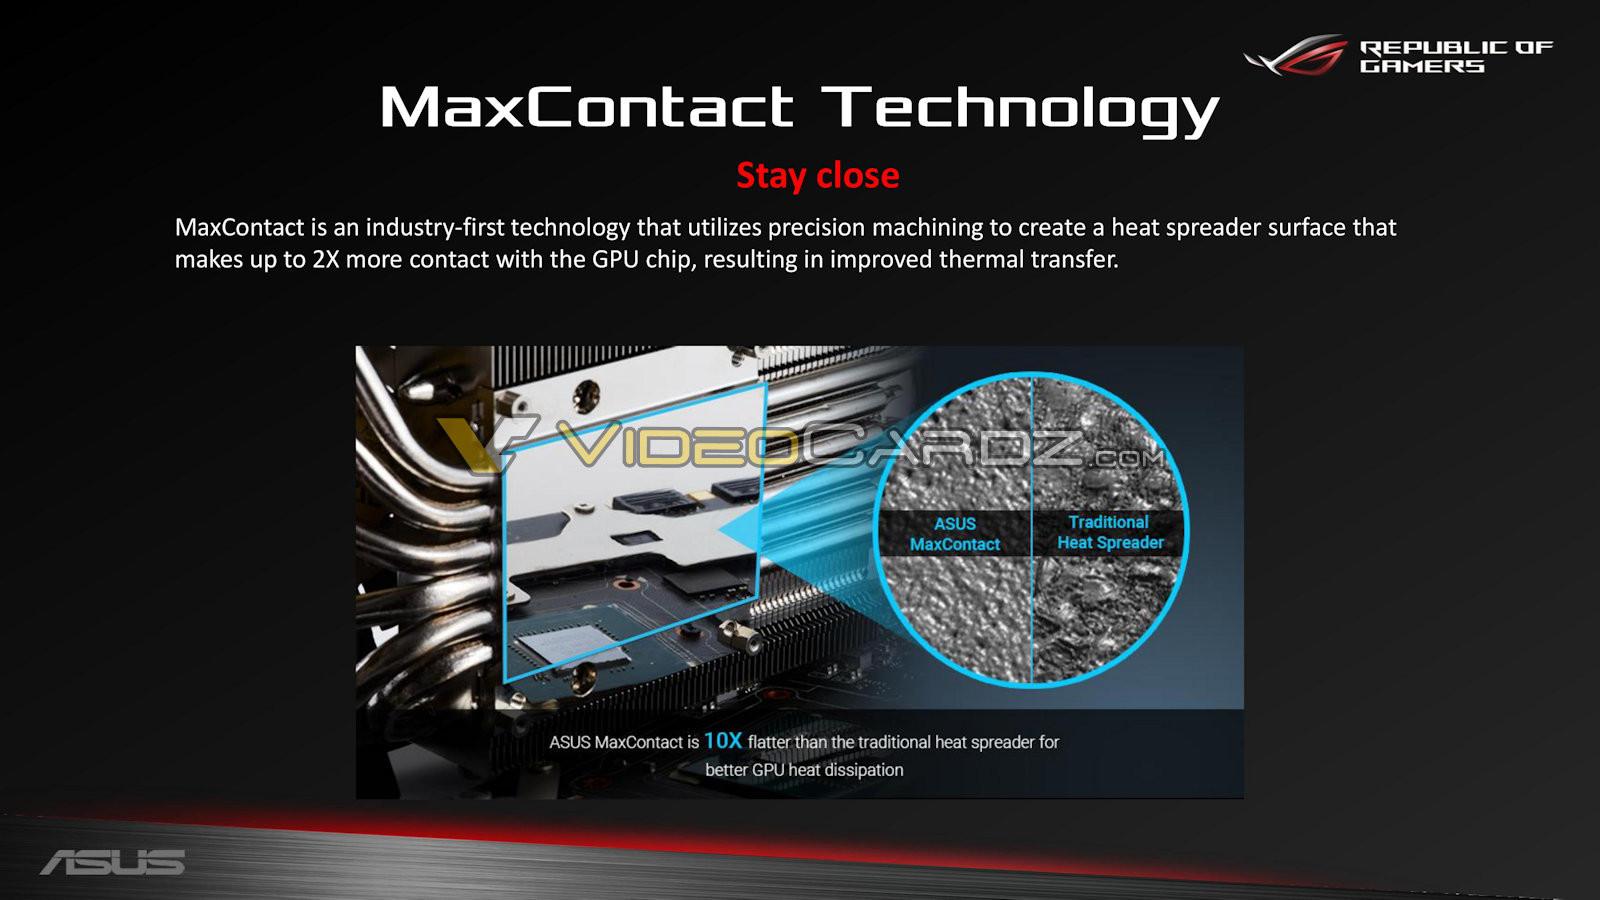 ASUS ROG Strix Radeon RX 5700 XT OC Detailed Some More | TechPowerUp